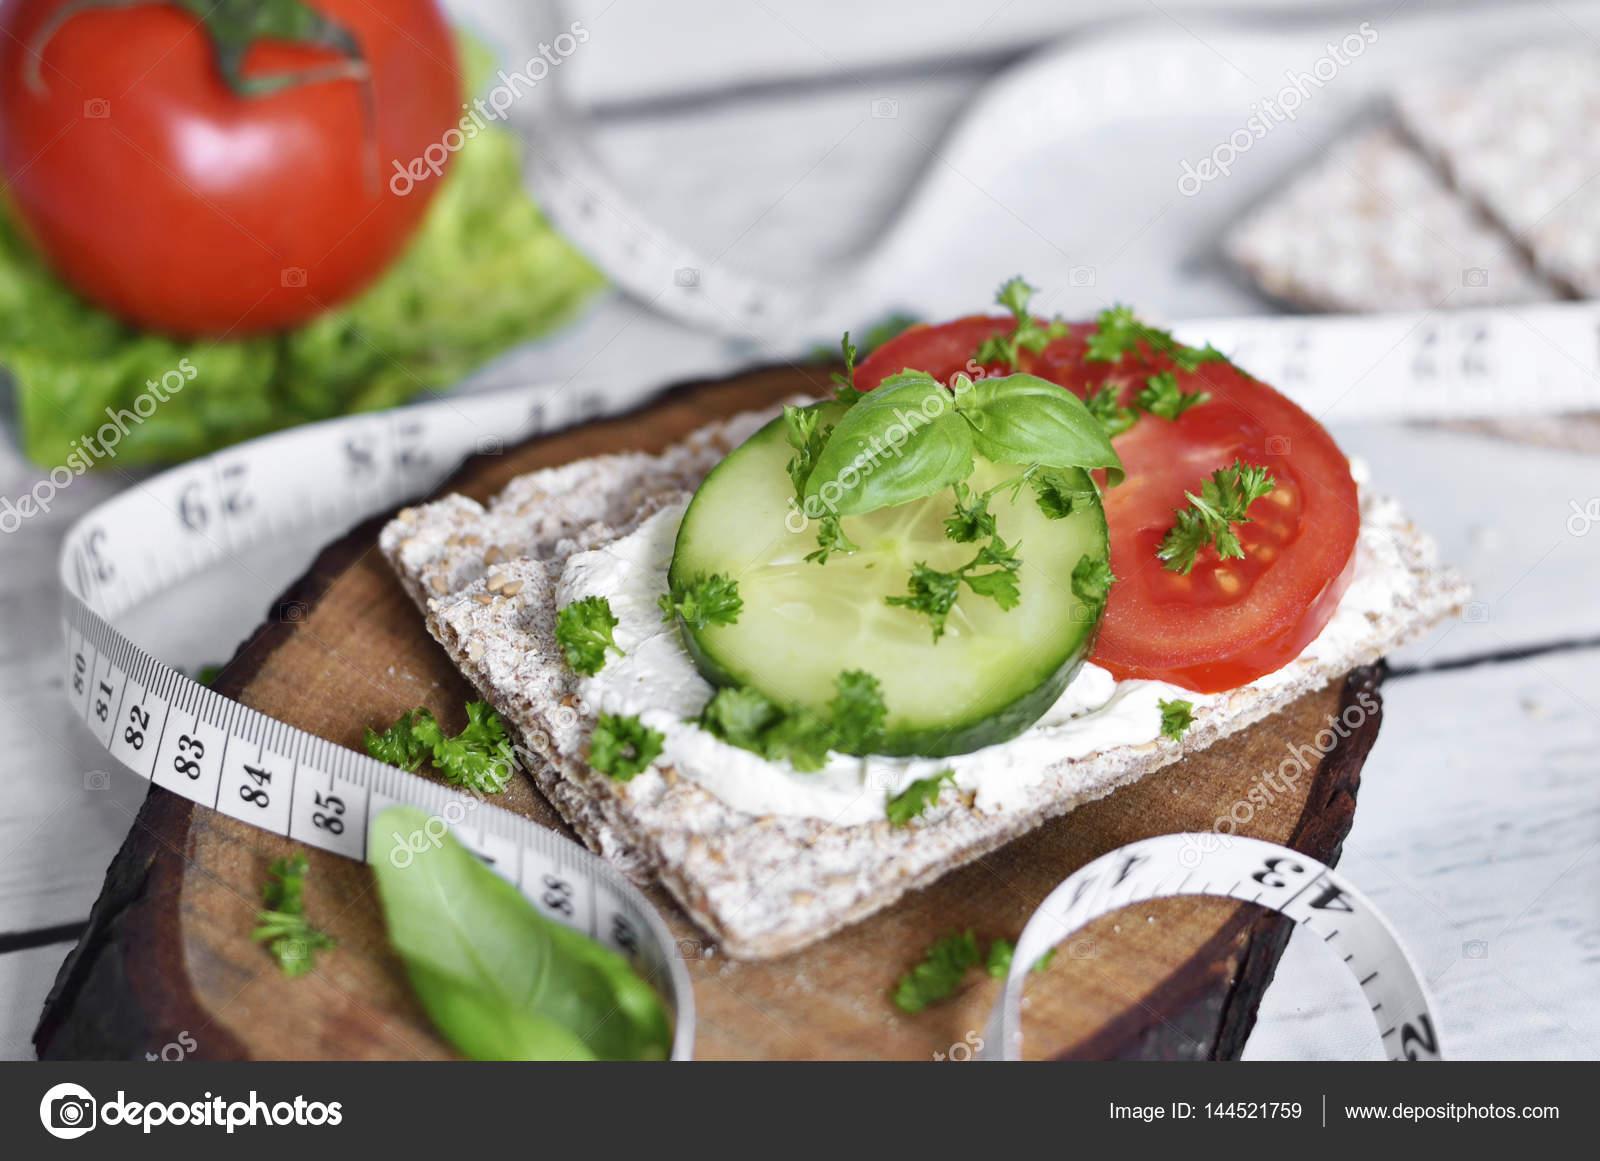 Gesunde Ernahrung Oder Diat Szene Mit Knackebrot Stockfoto